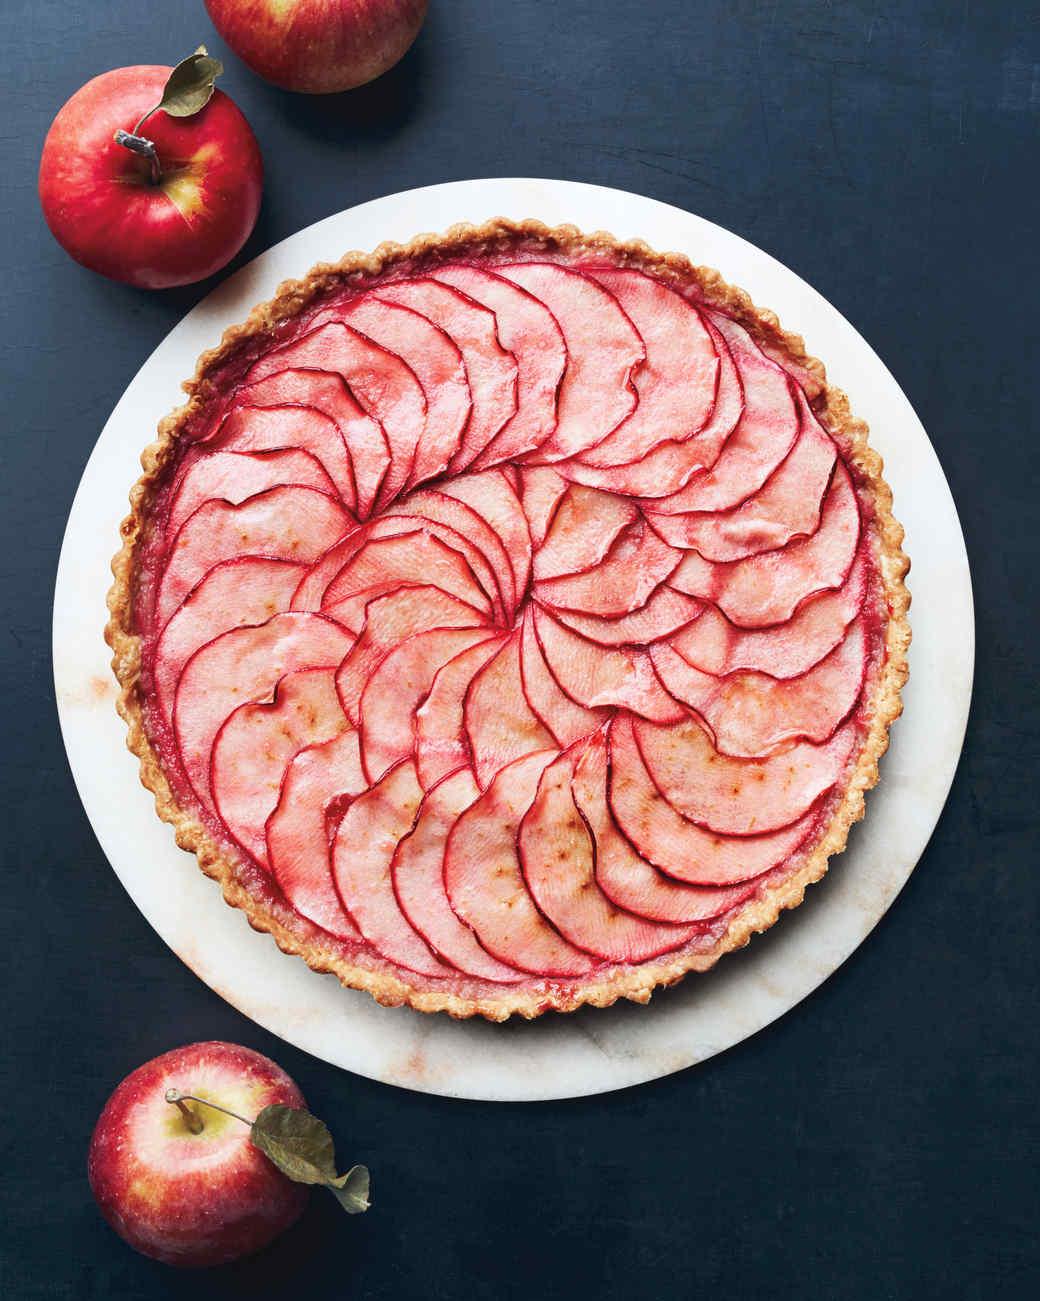 apple-tart-cv-076-d111347.jpg